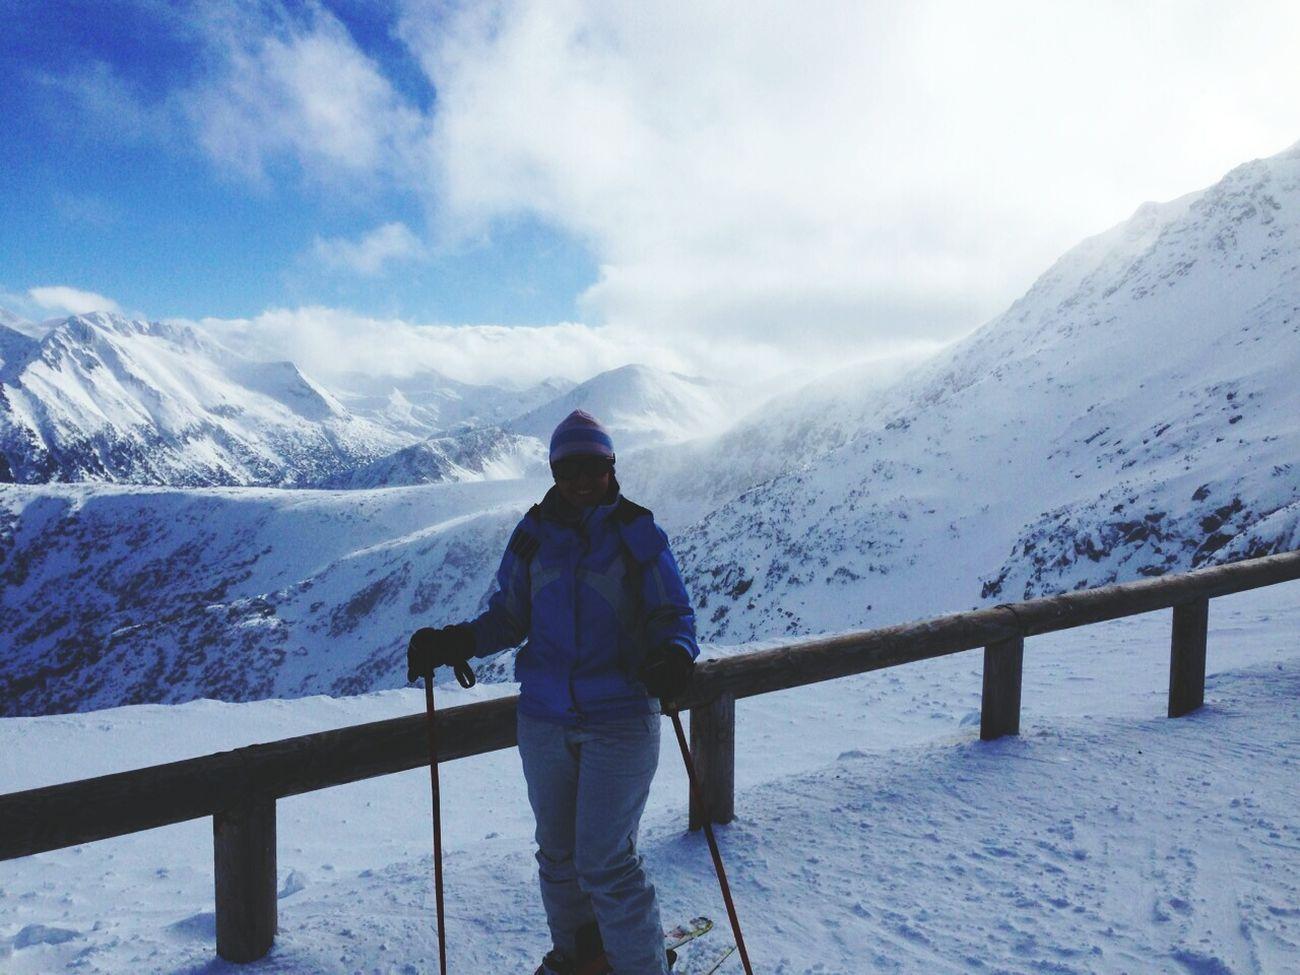 Skiing Enjoying The View